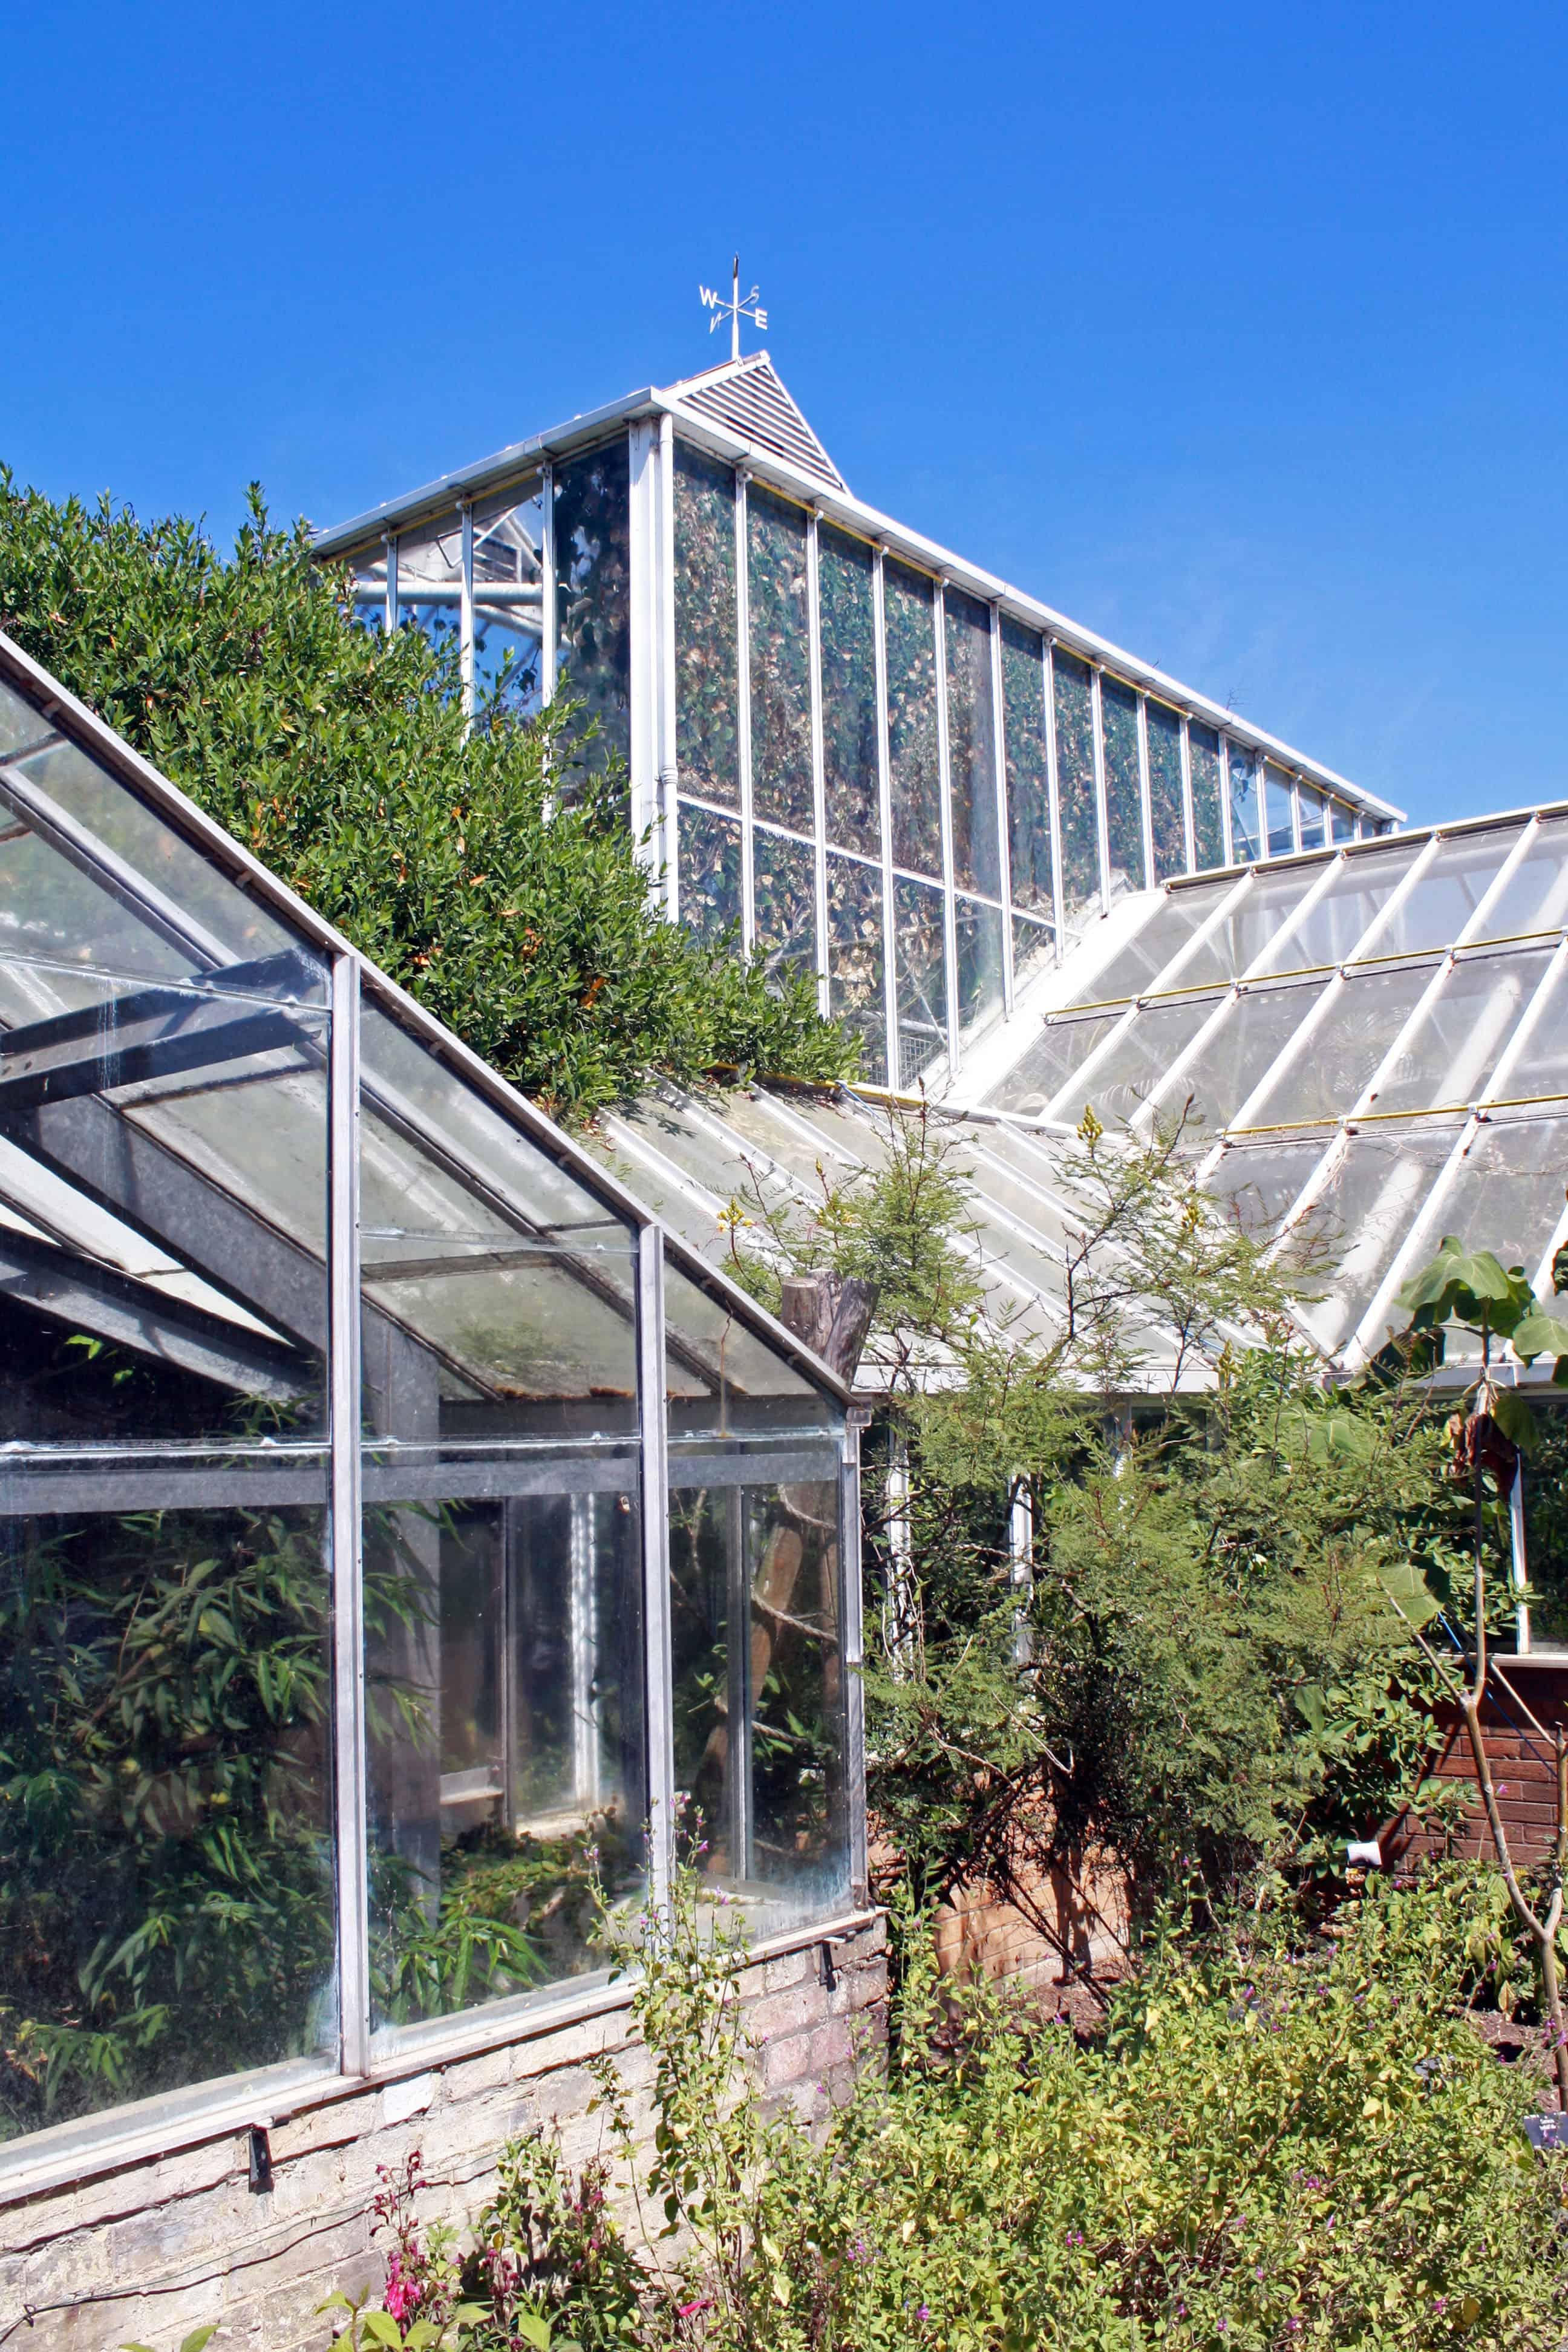 Greenhouse in Cambridge University Botanic Garden